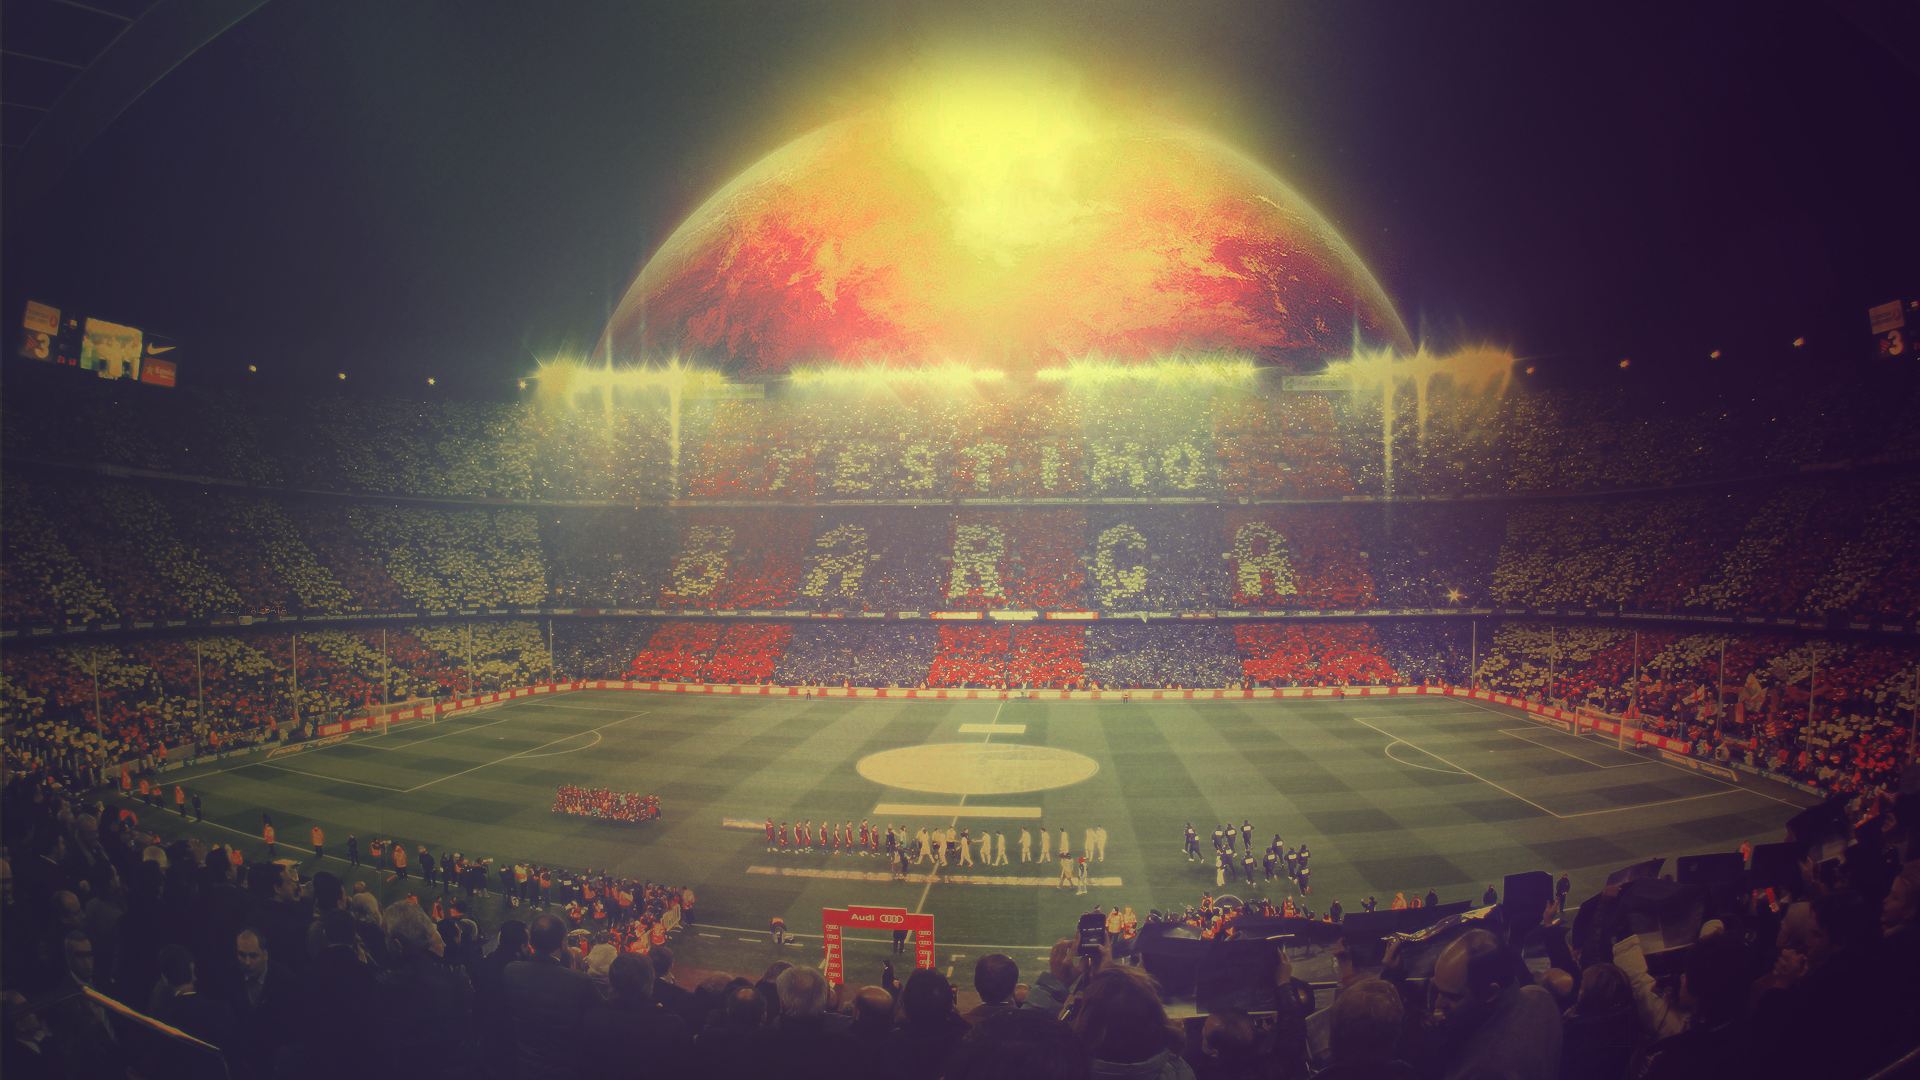 Camp Nou stadium wallpaper 14998 1920x1080